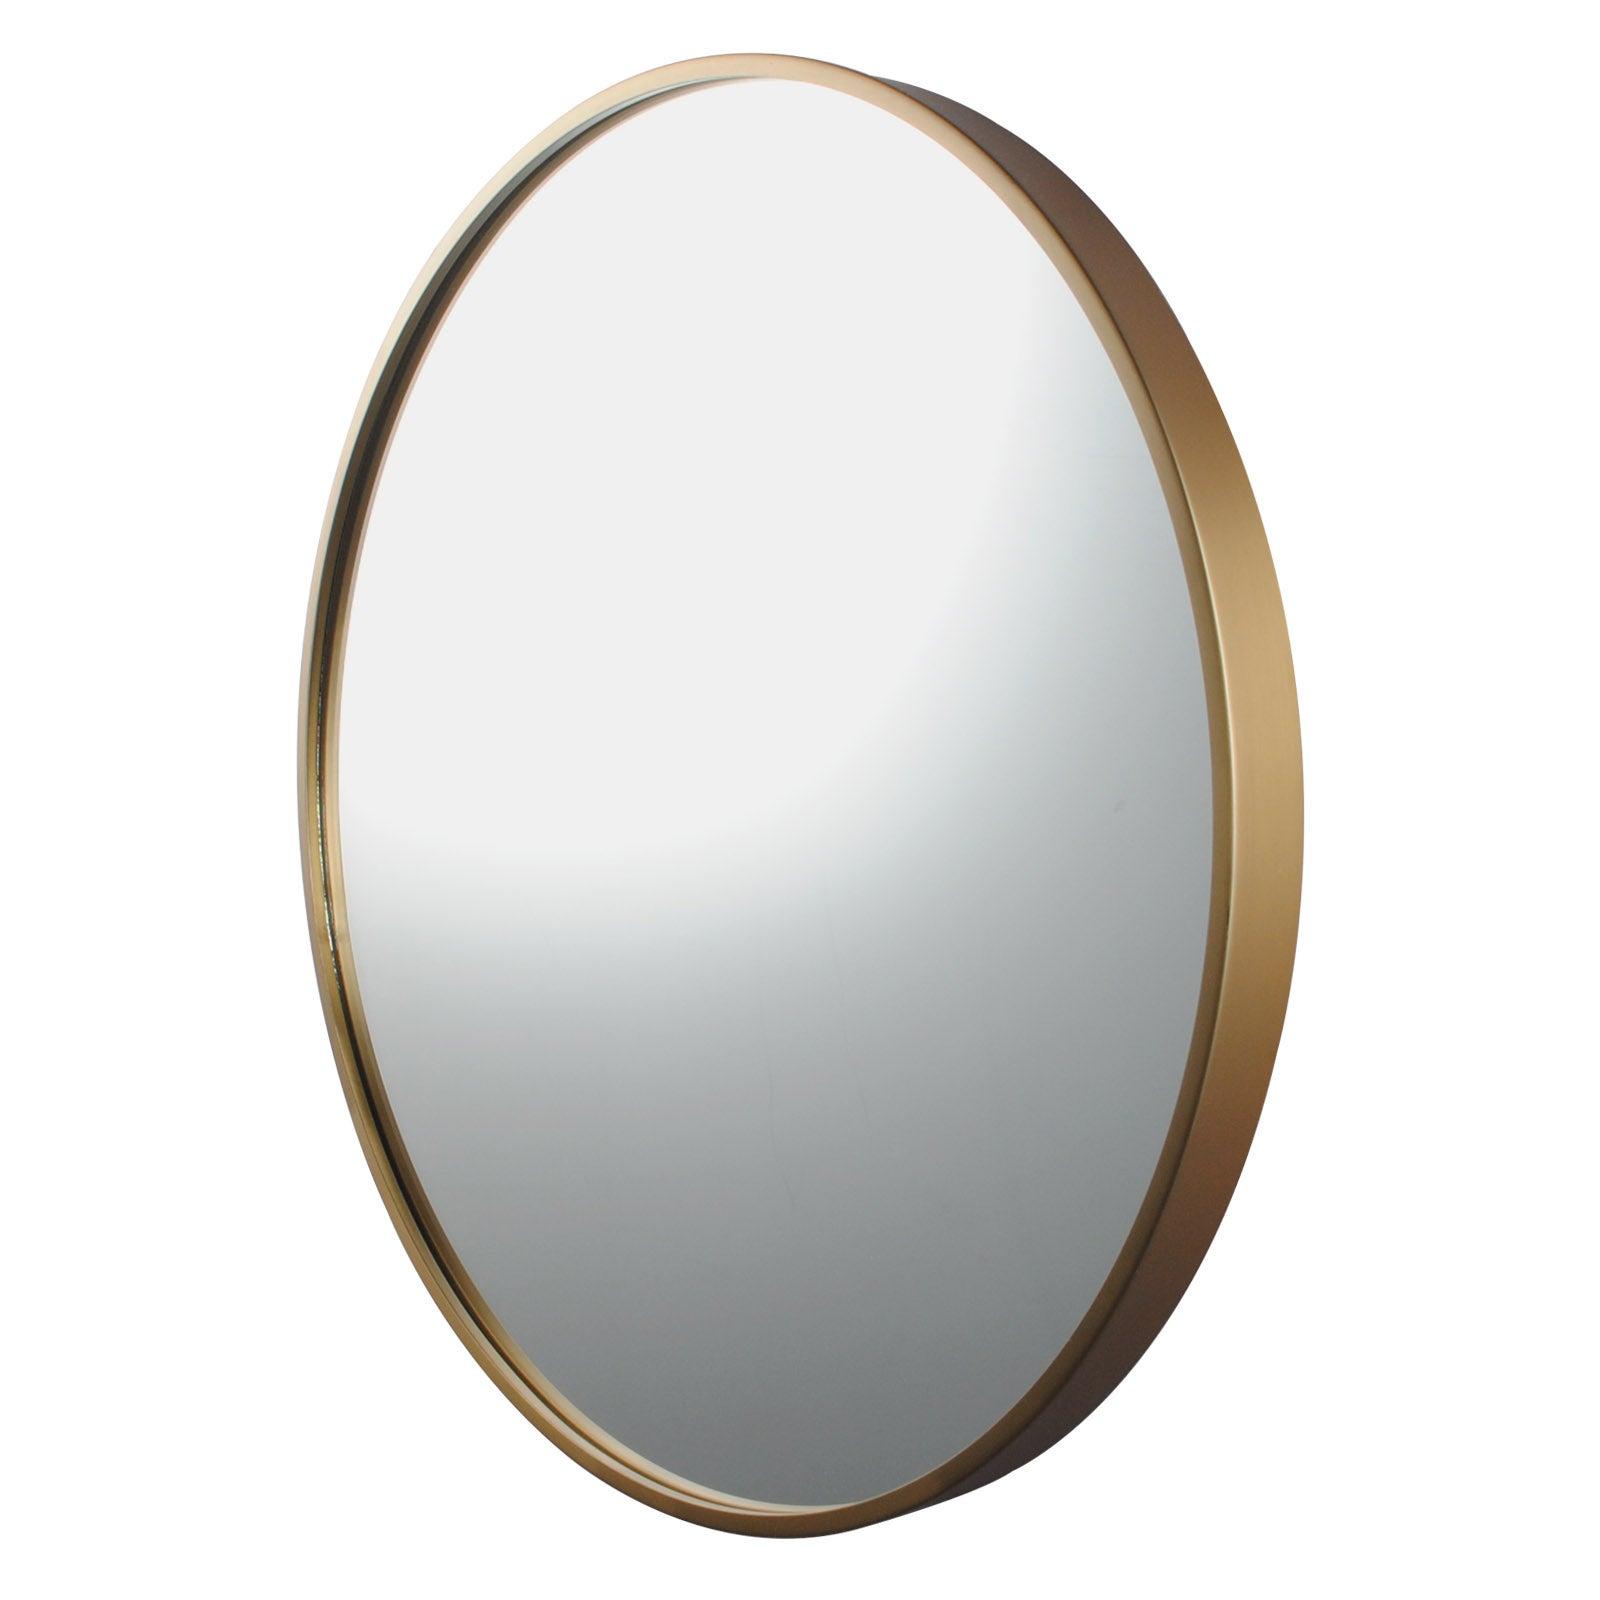 600x600x40mm Bathroom Mirror Golden Stainless Steel Framed Round Wall Mirror with Brackets